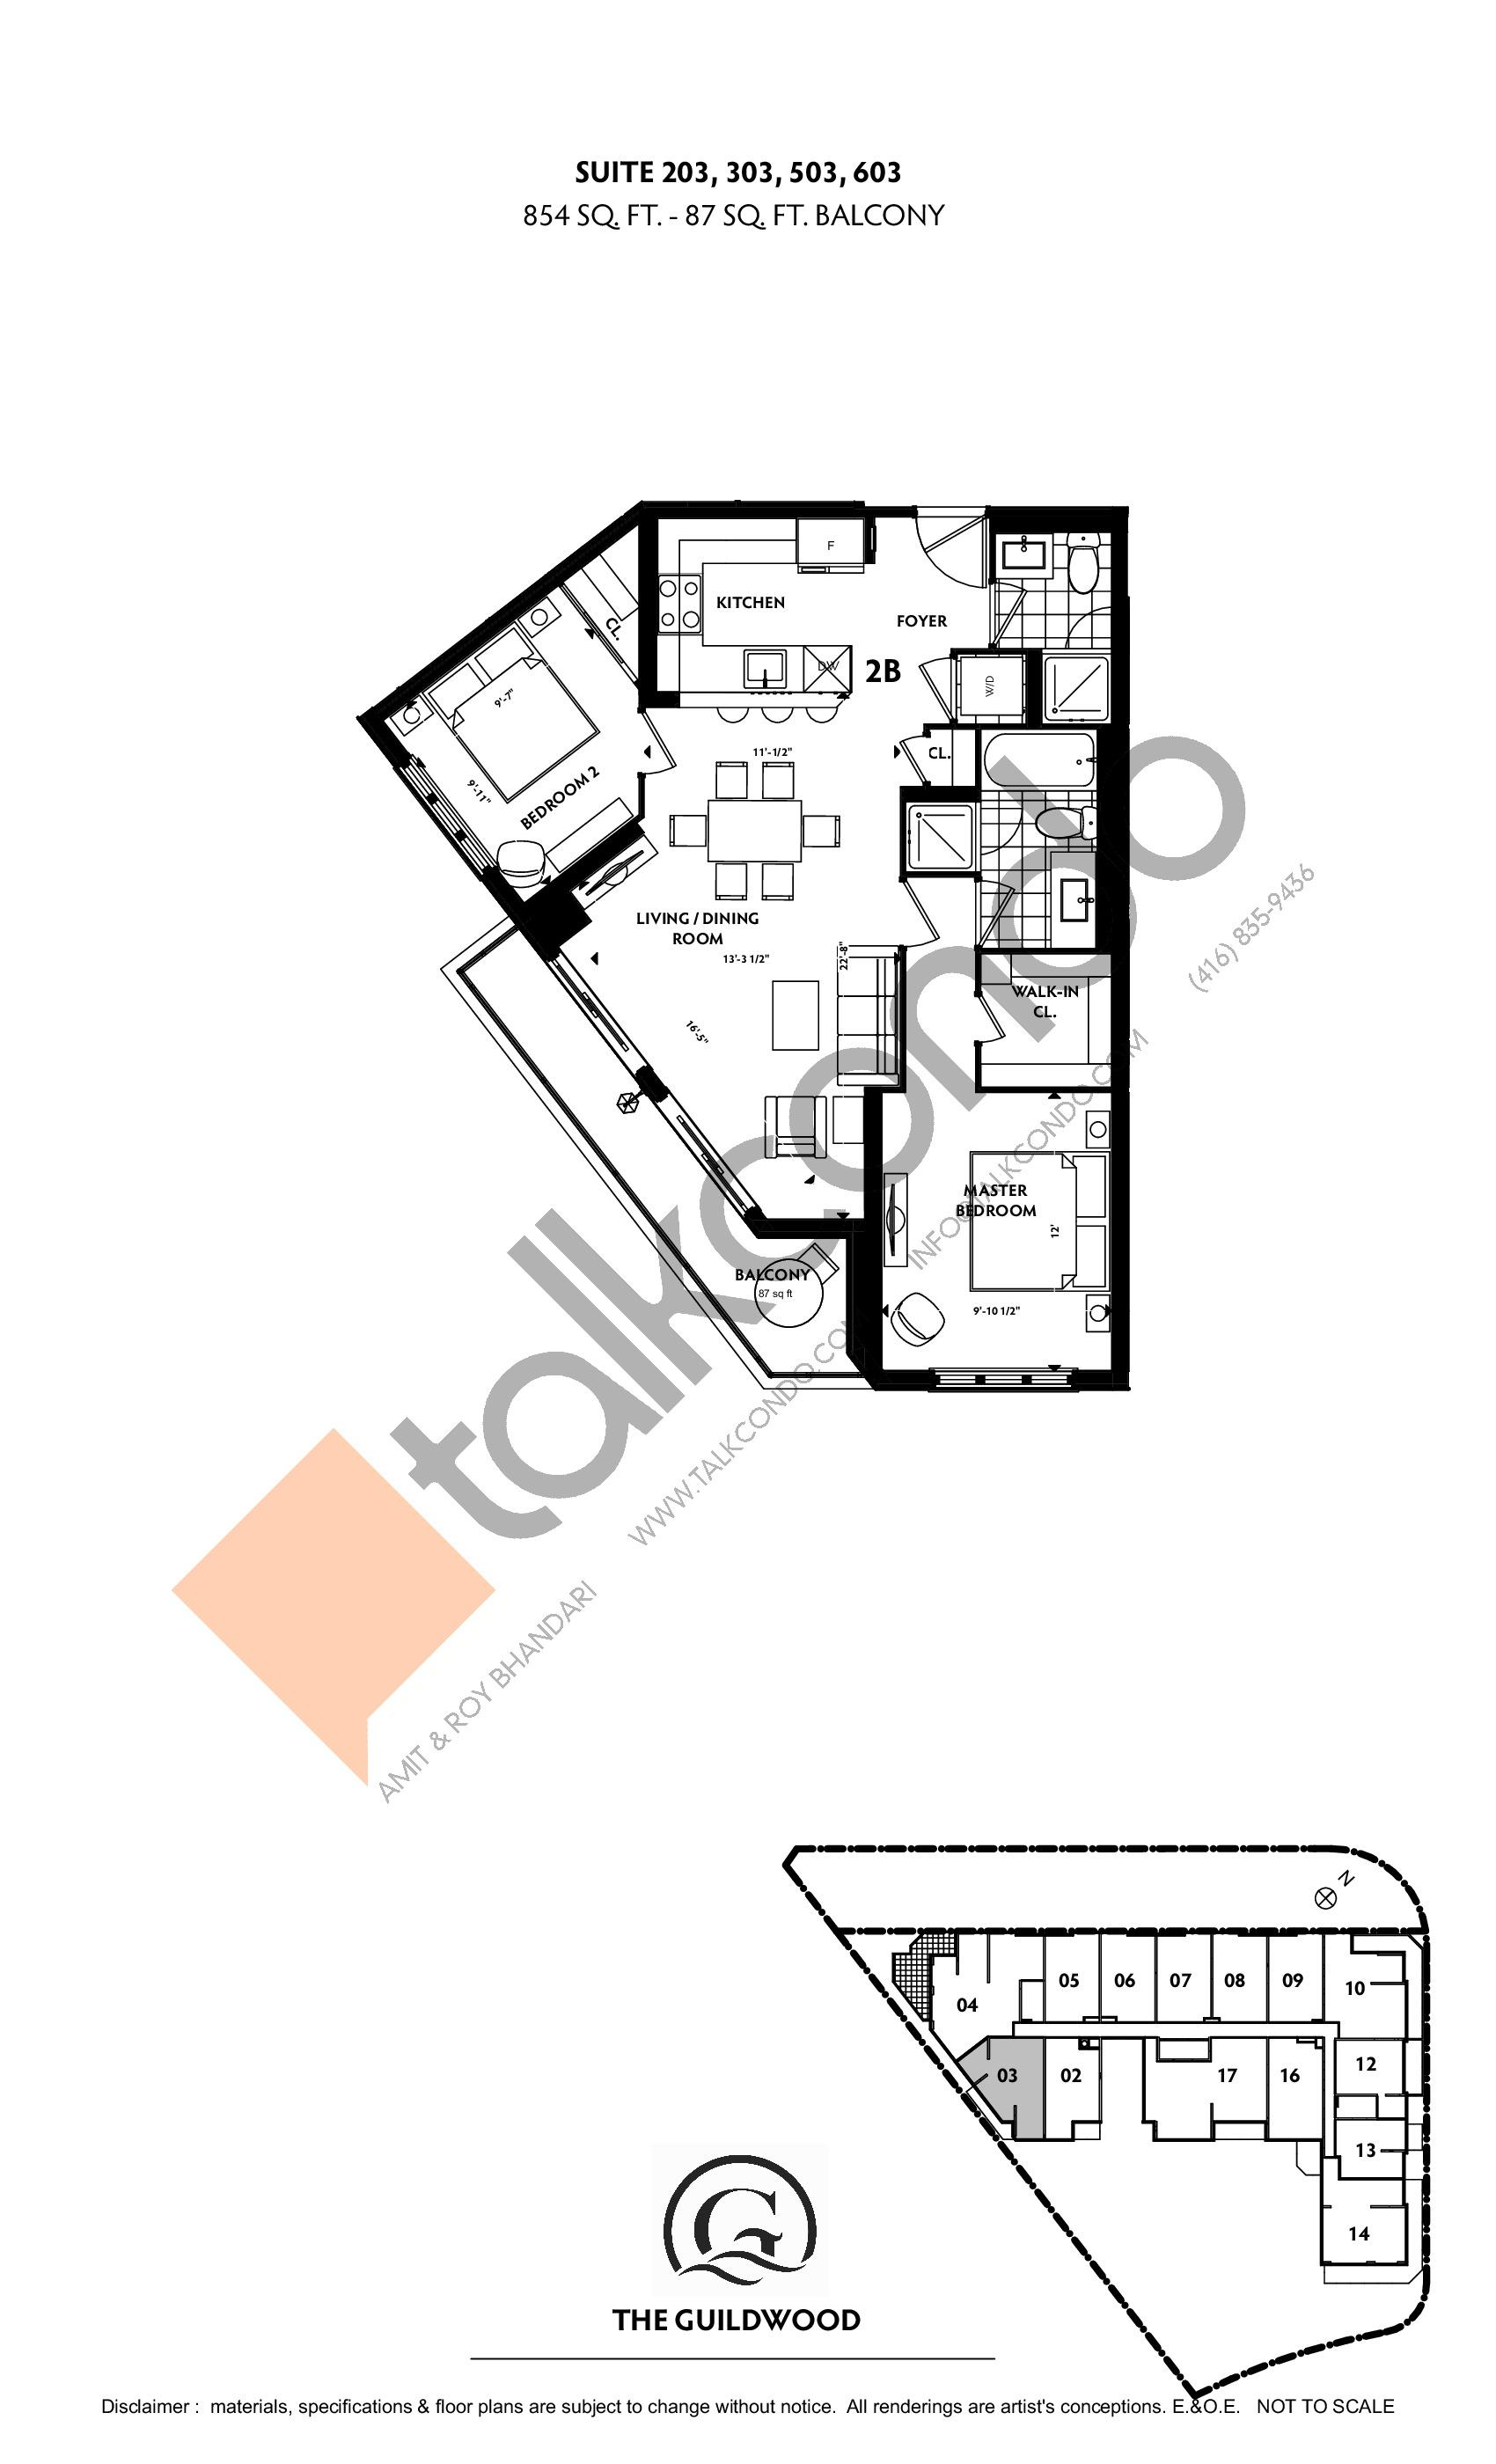 Suite 203, 303, 503, 603 Floor Plan at Guildwood Condos - 854 sq.ft